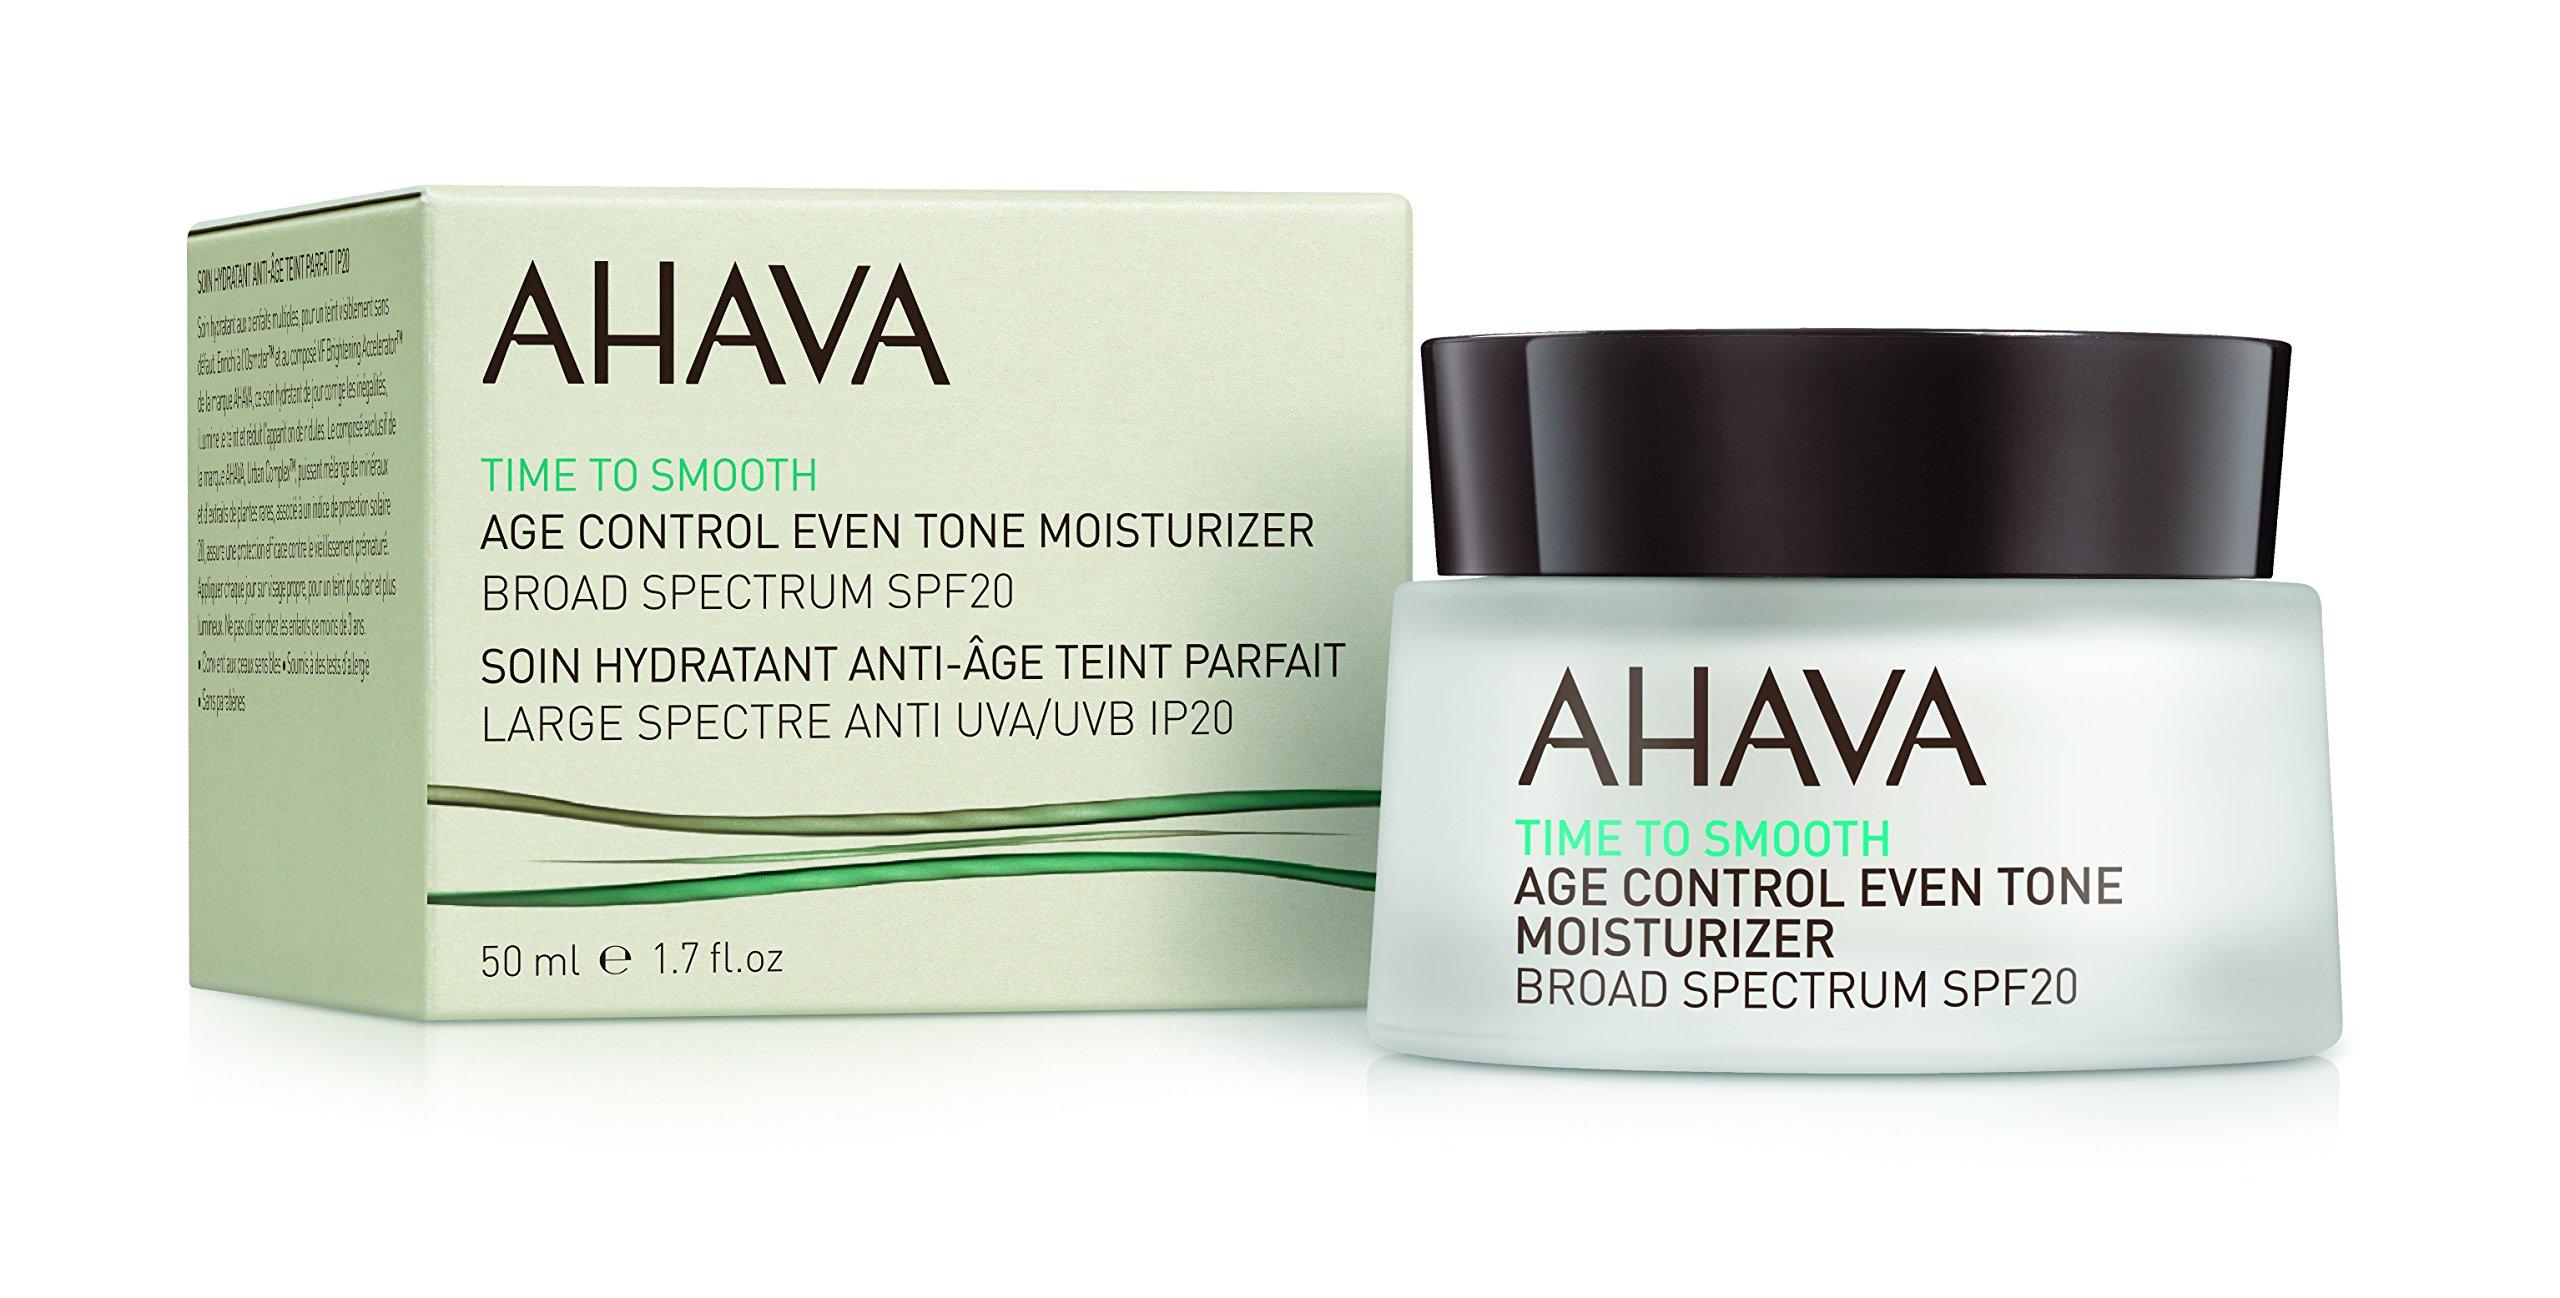 AHAVA Time to Smooth Age Control Even Tone Moisturizer Broad Spectrum SPF 20, 1.7 fl. oz.